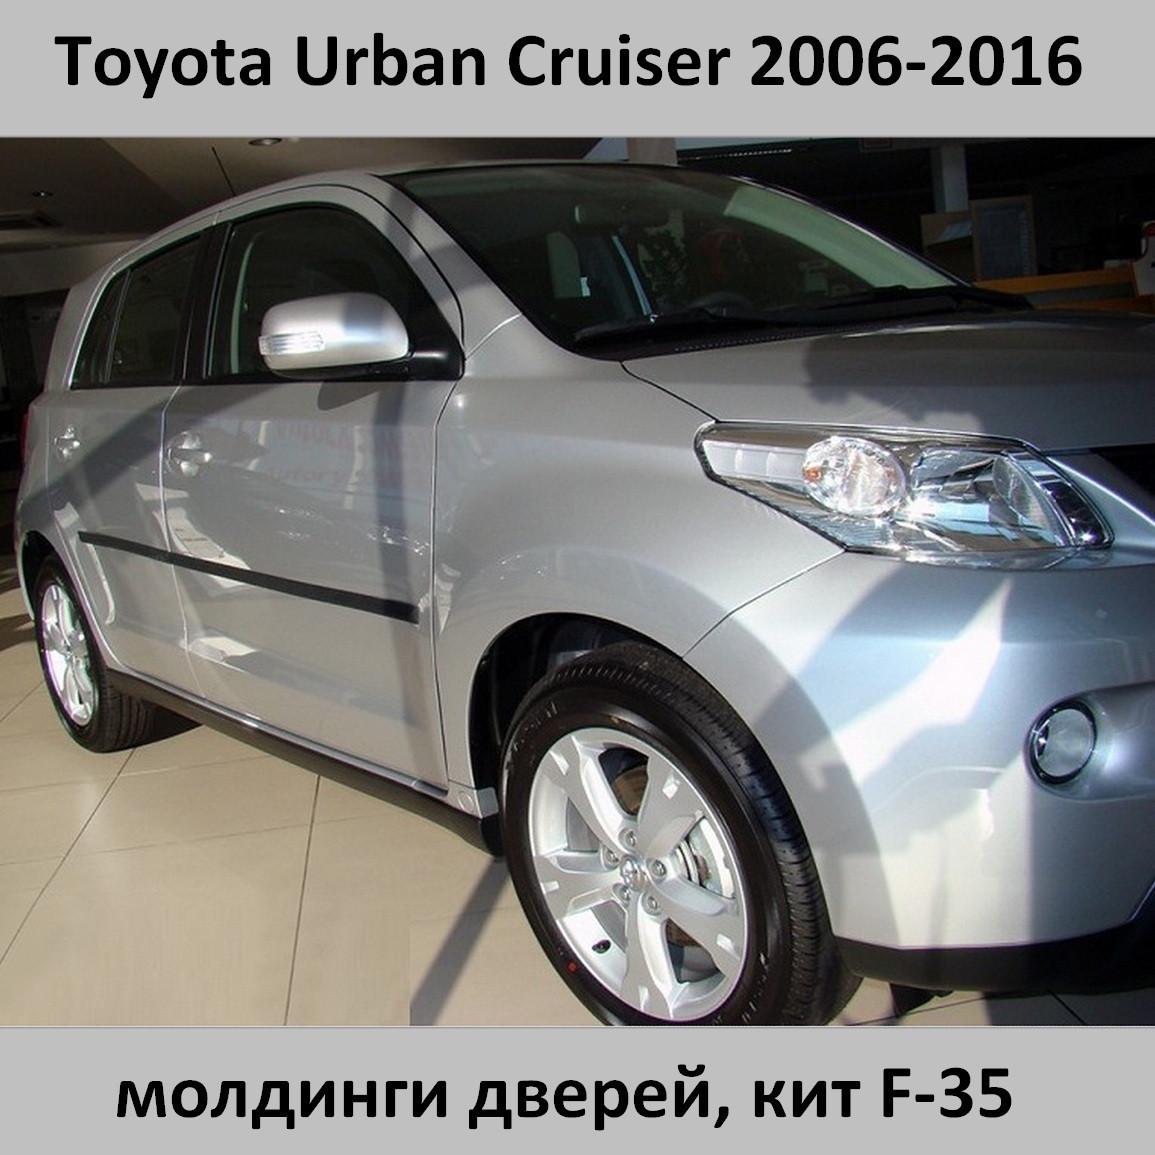 Молдинги на двери для Toyota Urban Cruiser 2006-2016